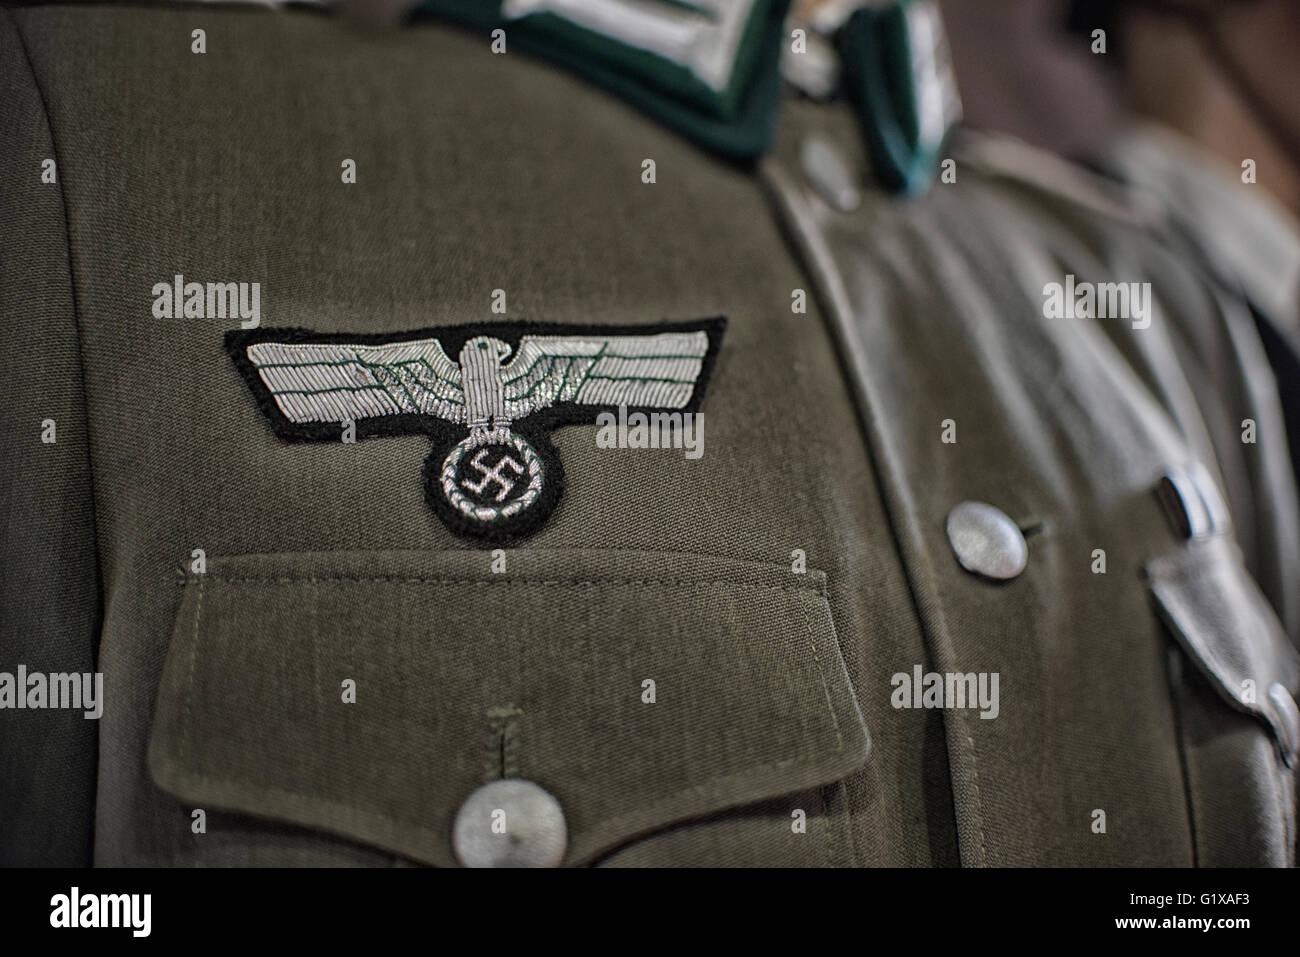 Nazi symbol on uniform stock photo 104455879 alamy nazi symbol on uniform biocorpaavc Gallery